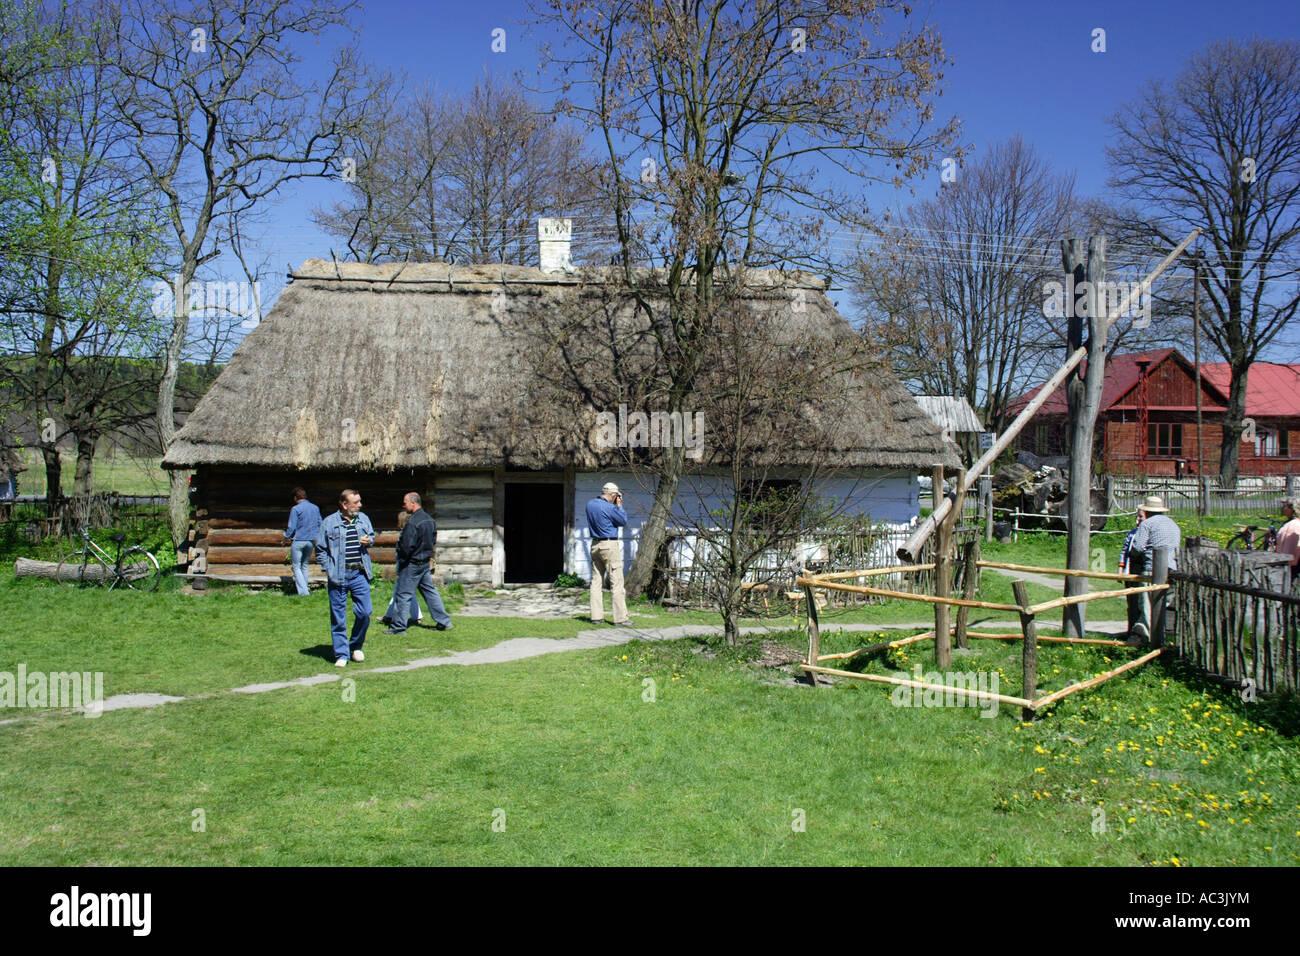 Zagroda Guciow farm open air folk museum in Roztocze region Poland Stock Photo